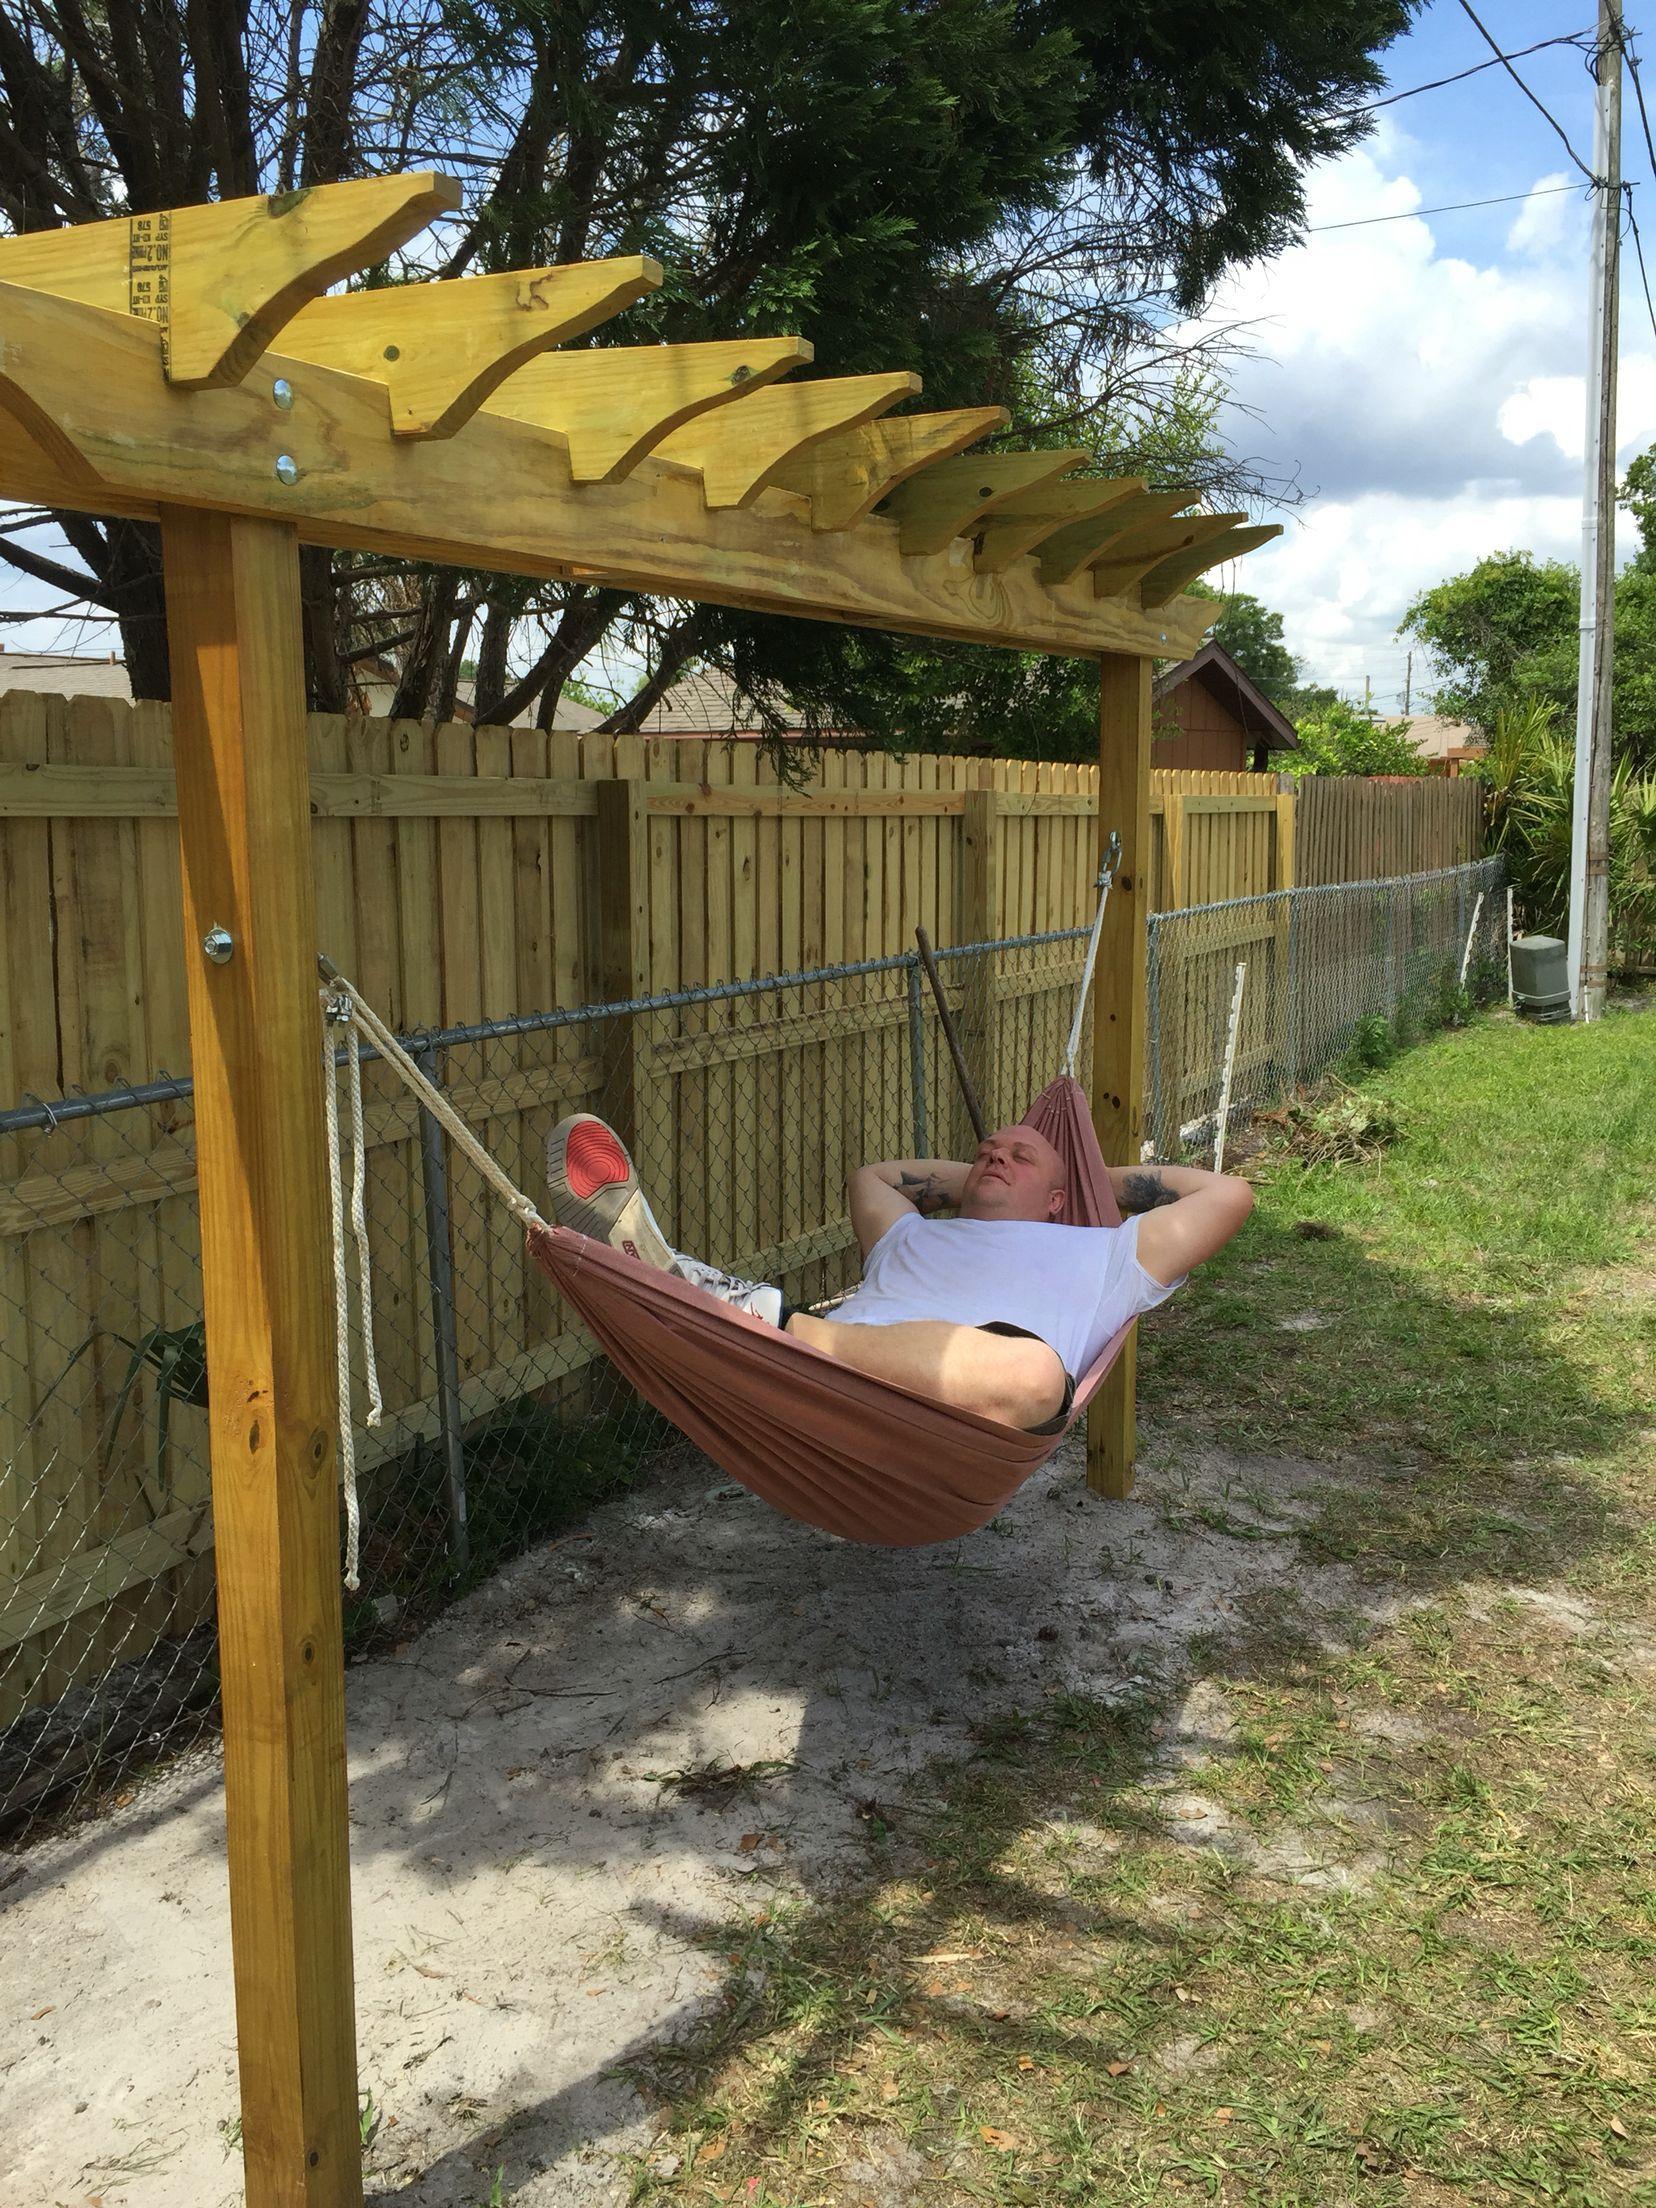 21 Brilliant Hammock Ideas For A Laid Back Staycation Backyard Pergola Outdoor Pergola Backyard Hammock